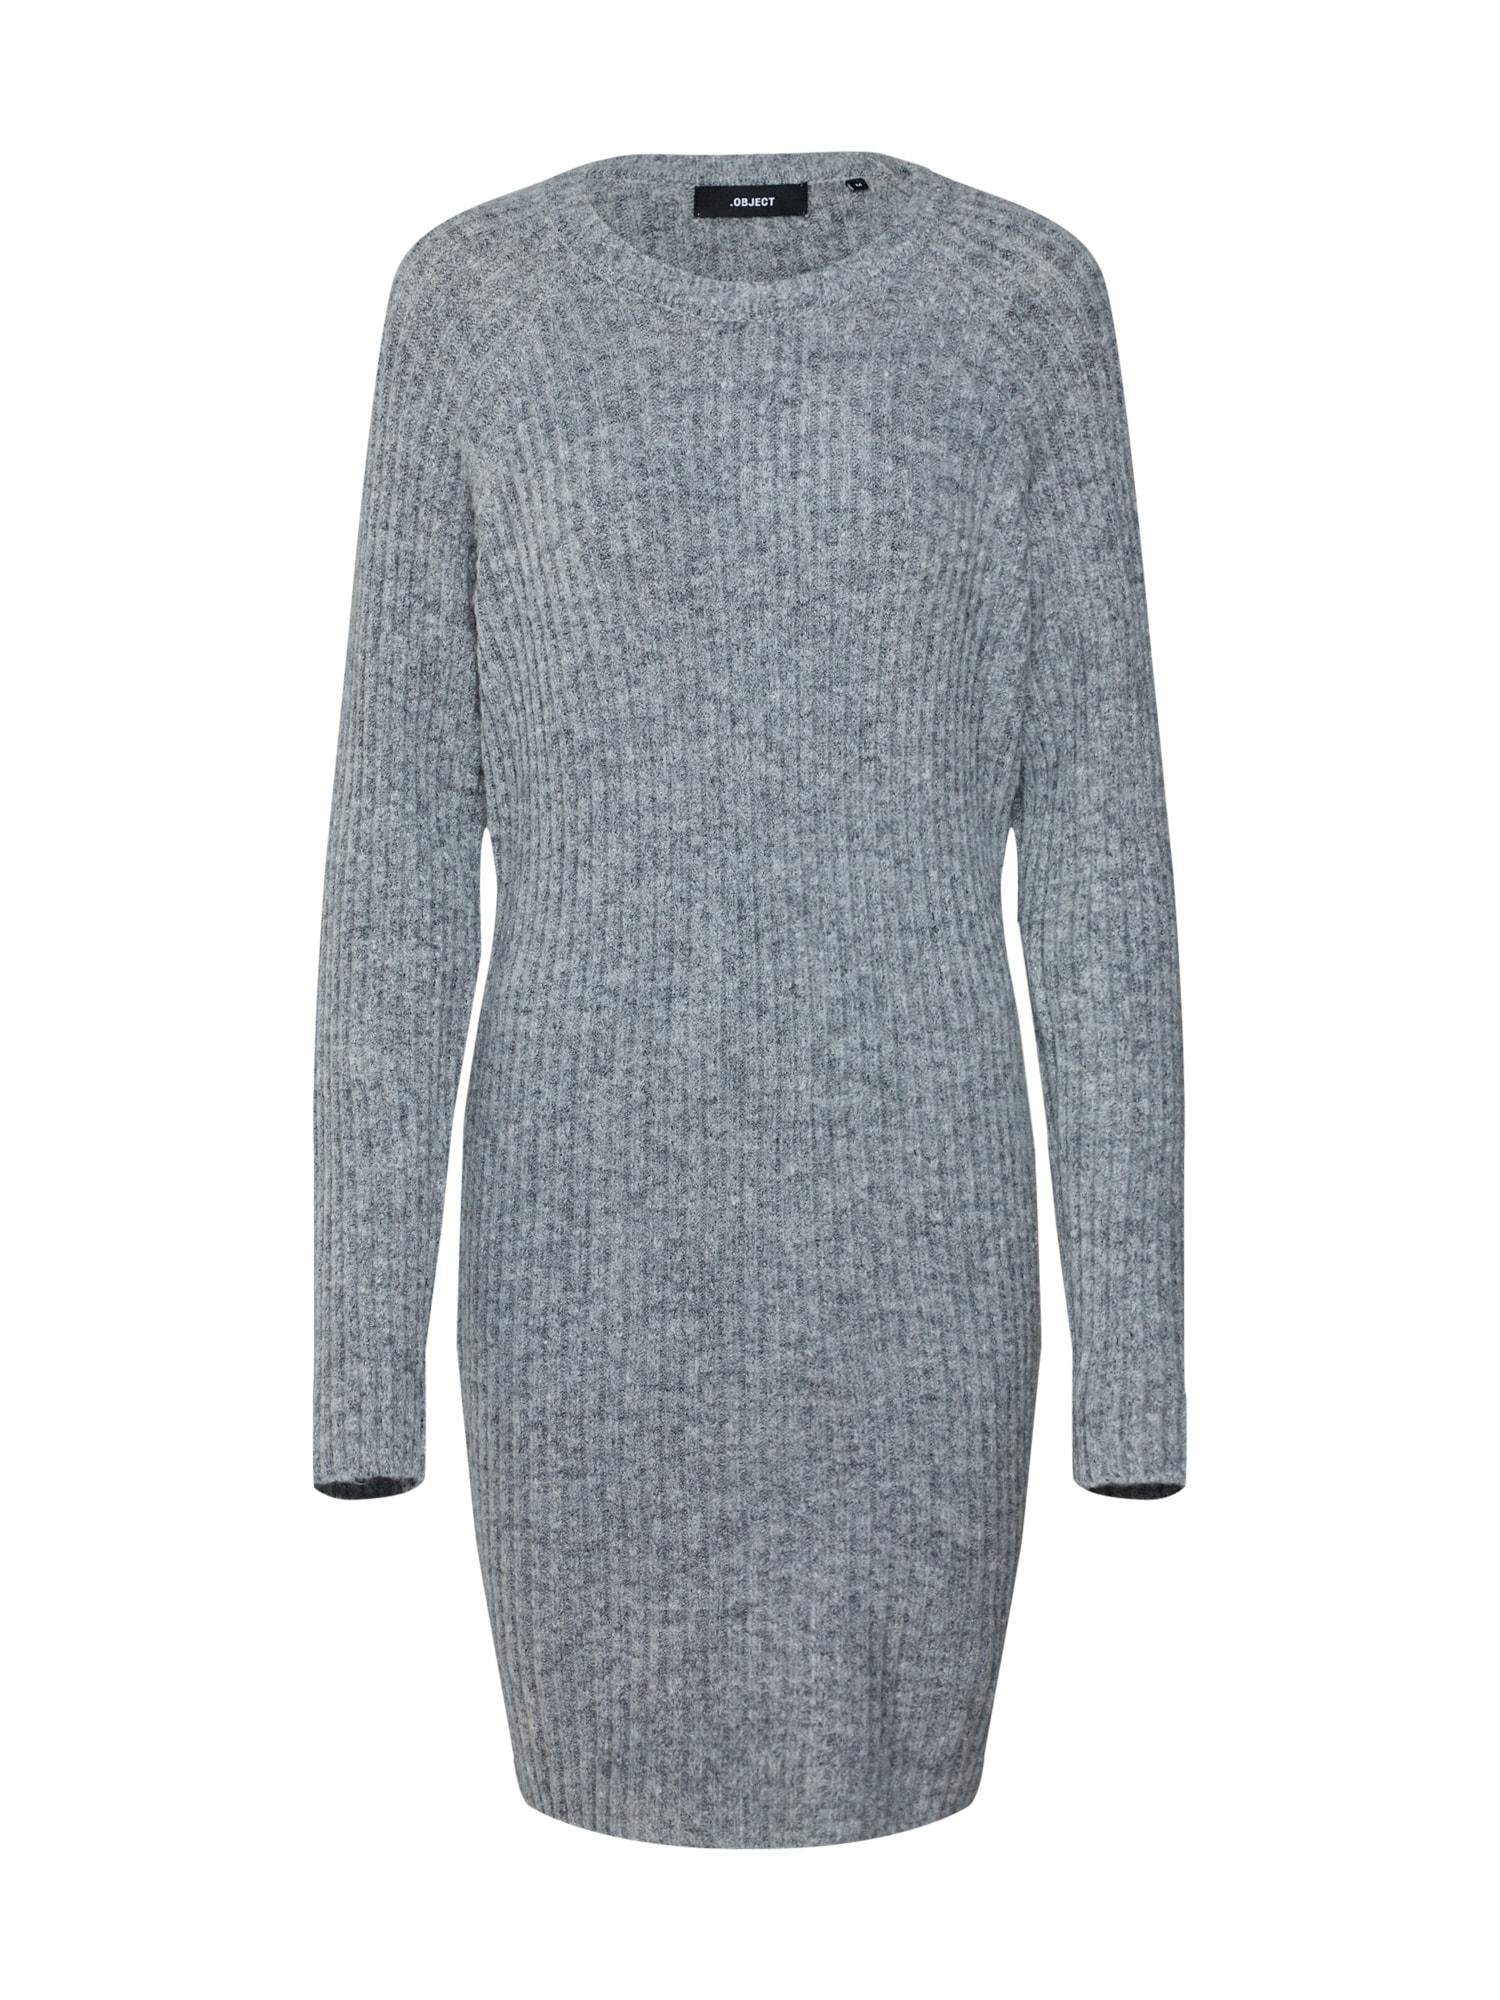 Úpletové šaty OBJNONSIA šedý melír OBJECT